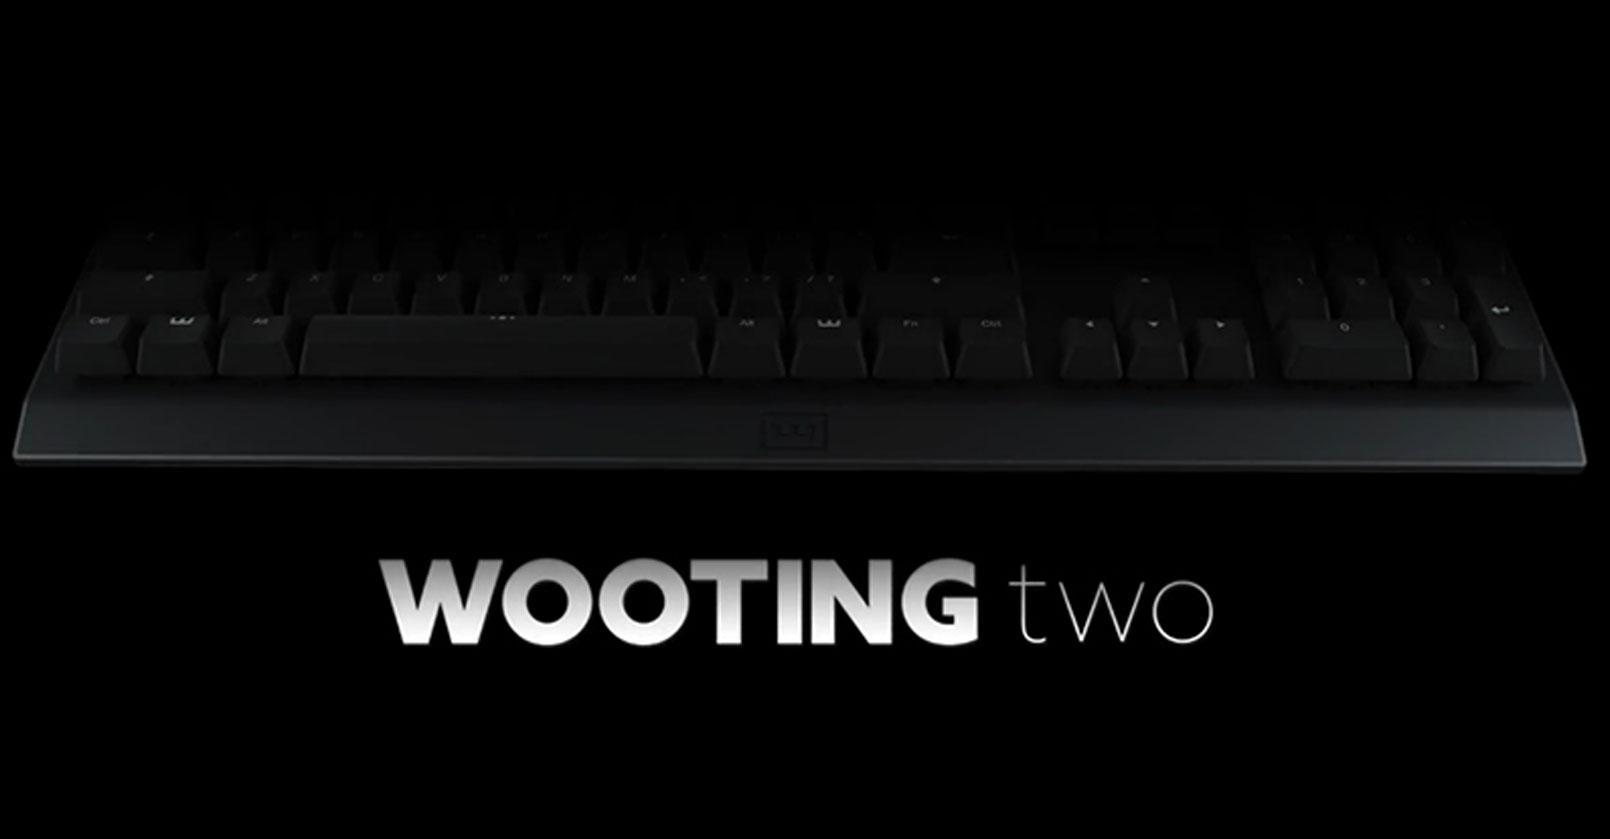 Wooting two, teclado gaming analógico